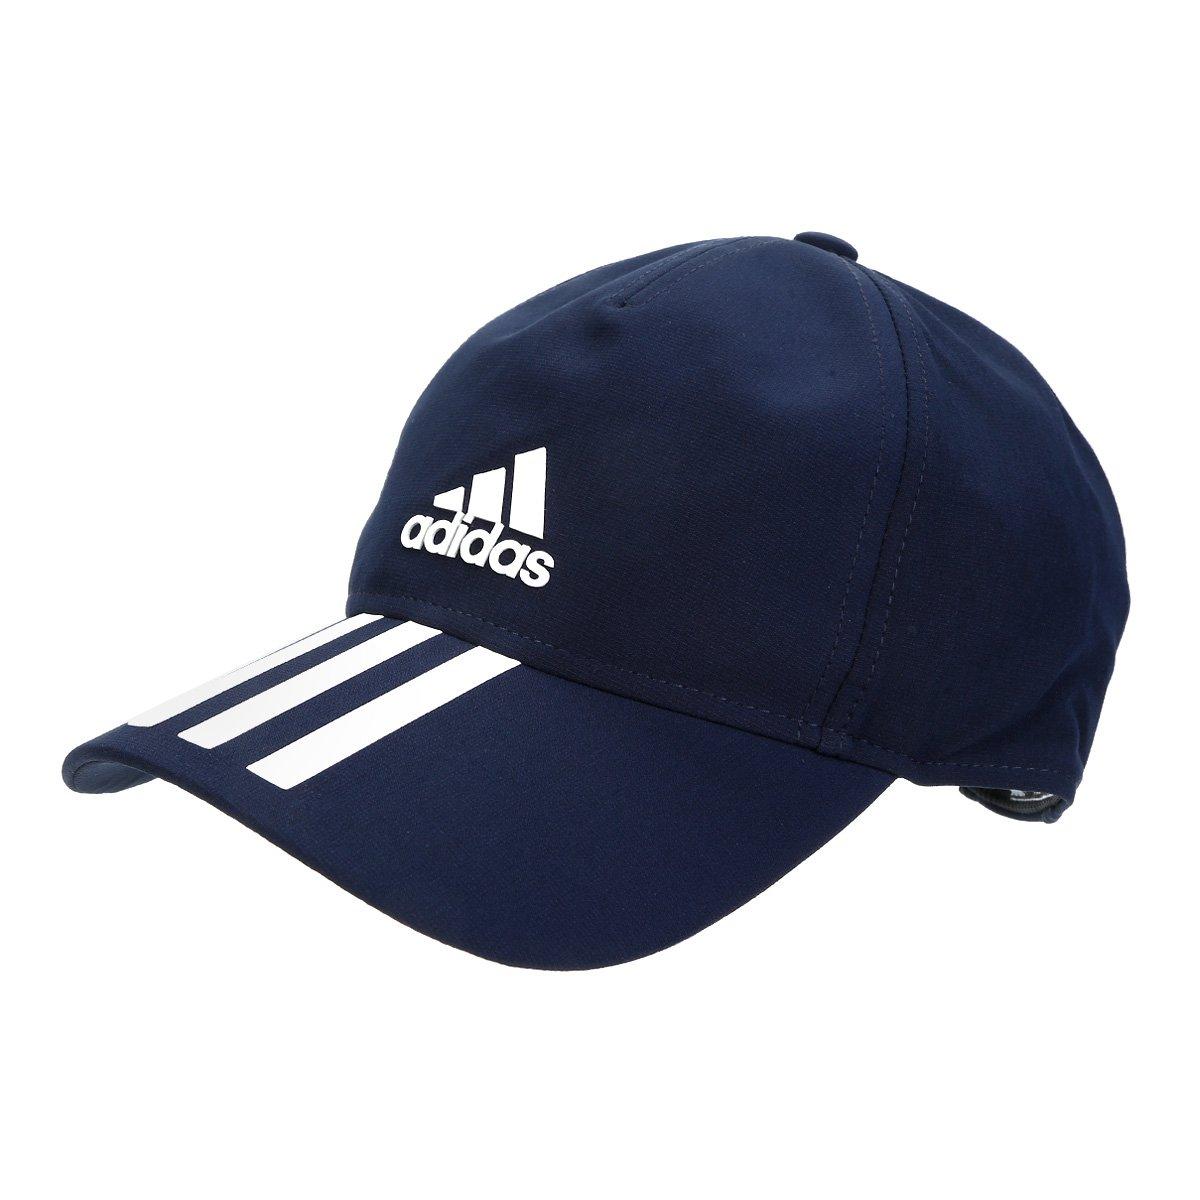 33fd3629347bc Boné Adidas Aba Curva C40 6P 3 Stripes Aba Curva - Shopping TudoAzul